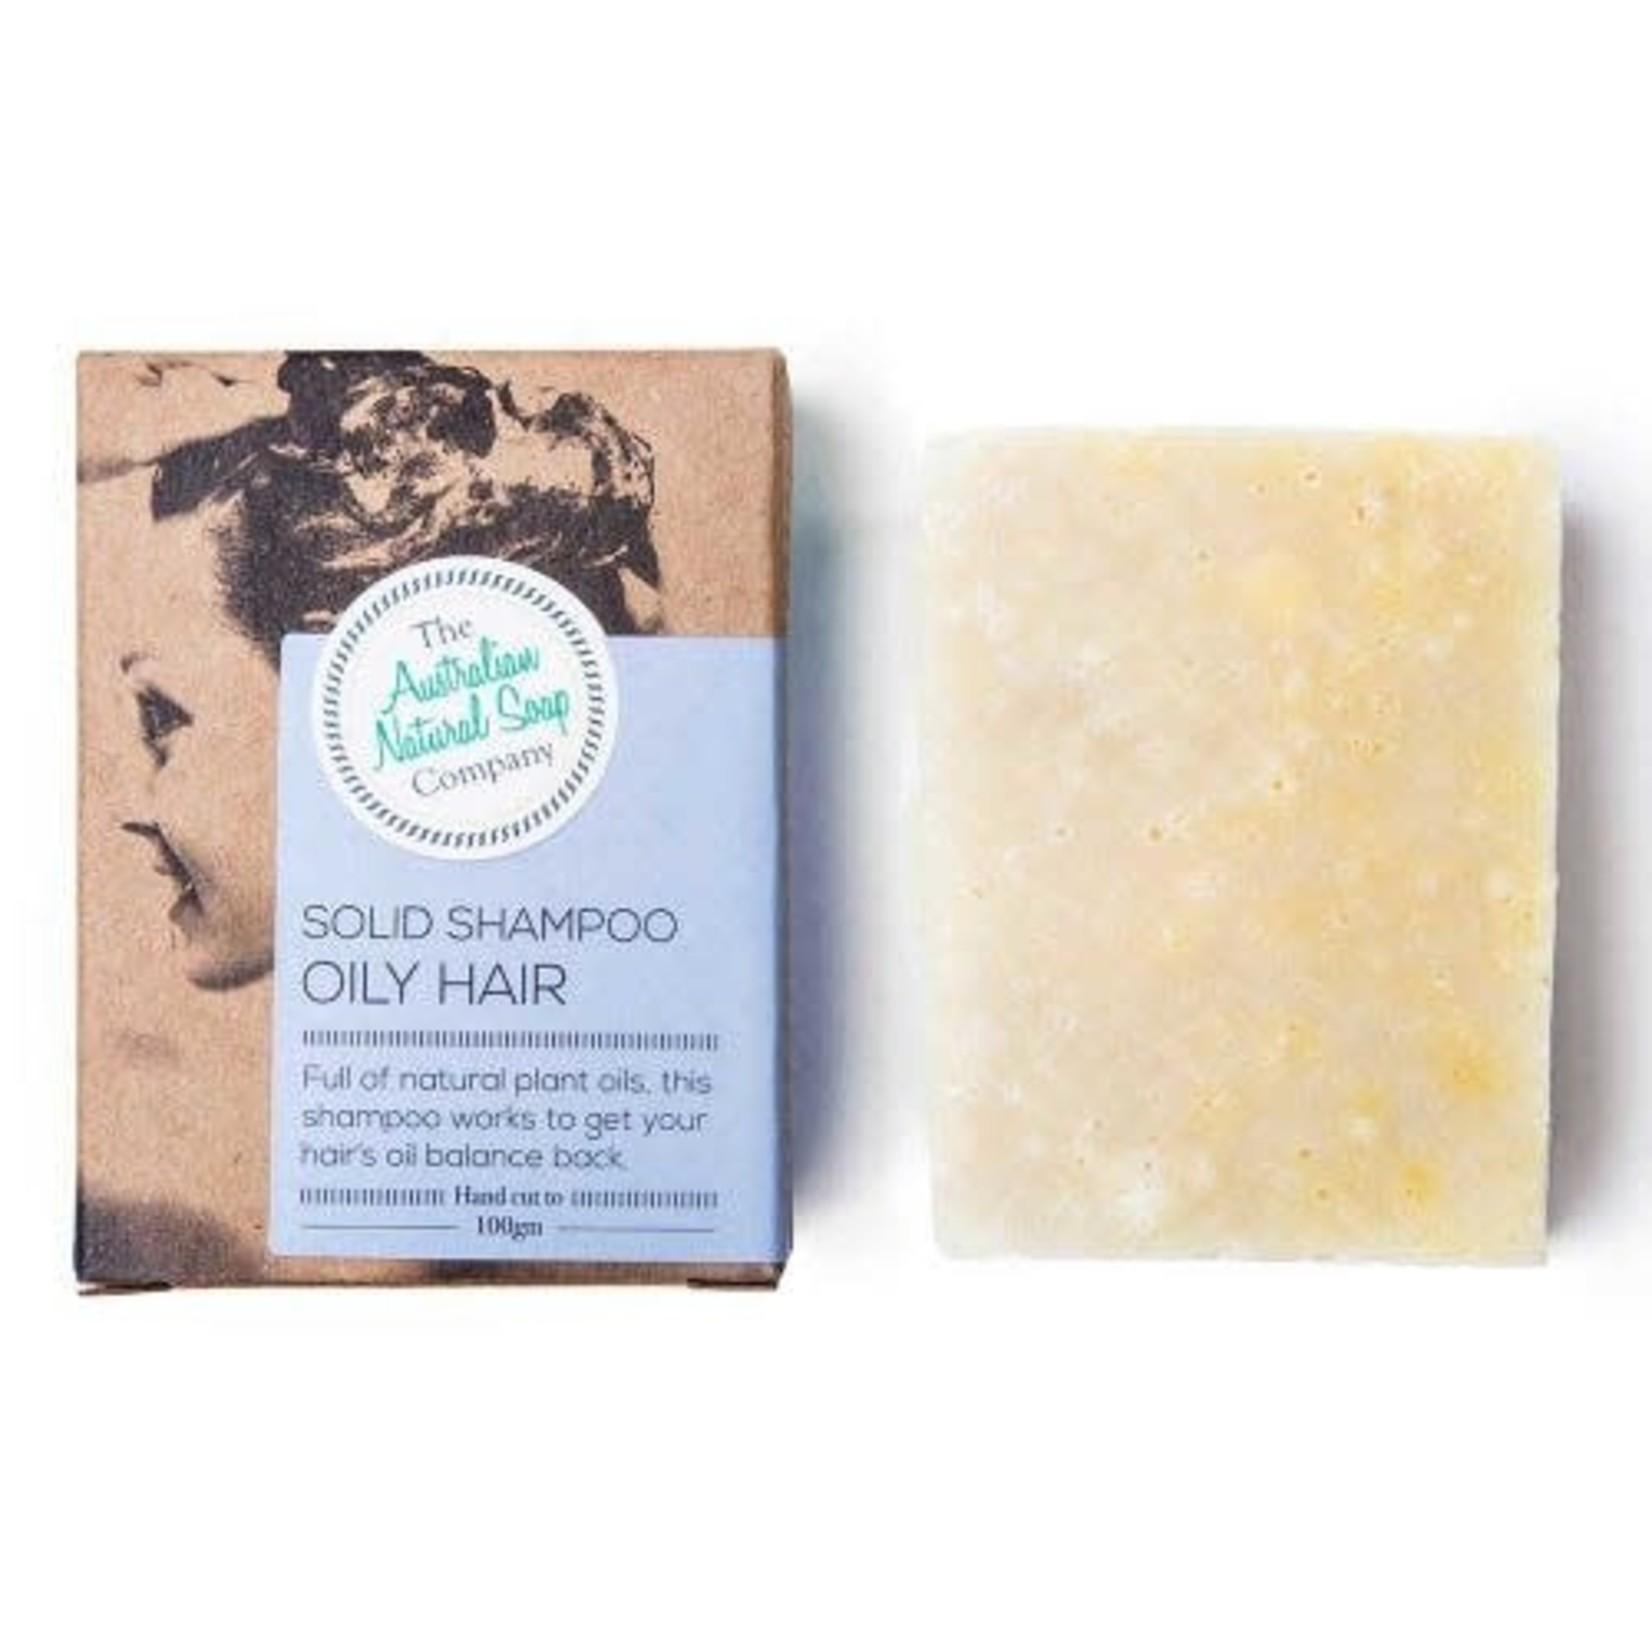 The Australian Natural Soap Company The Australian Natural Soap Company Shampoo Bar Oily Hair